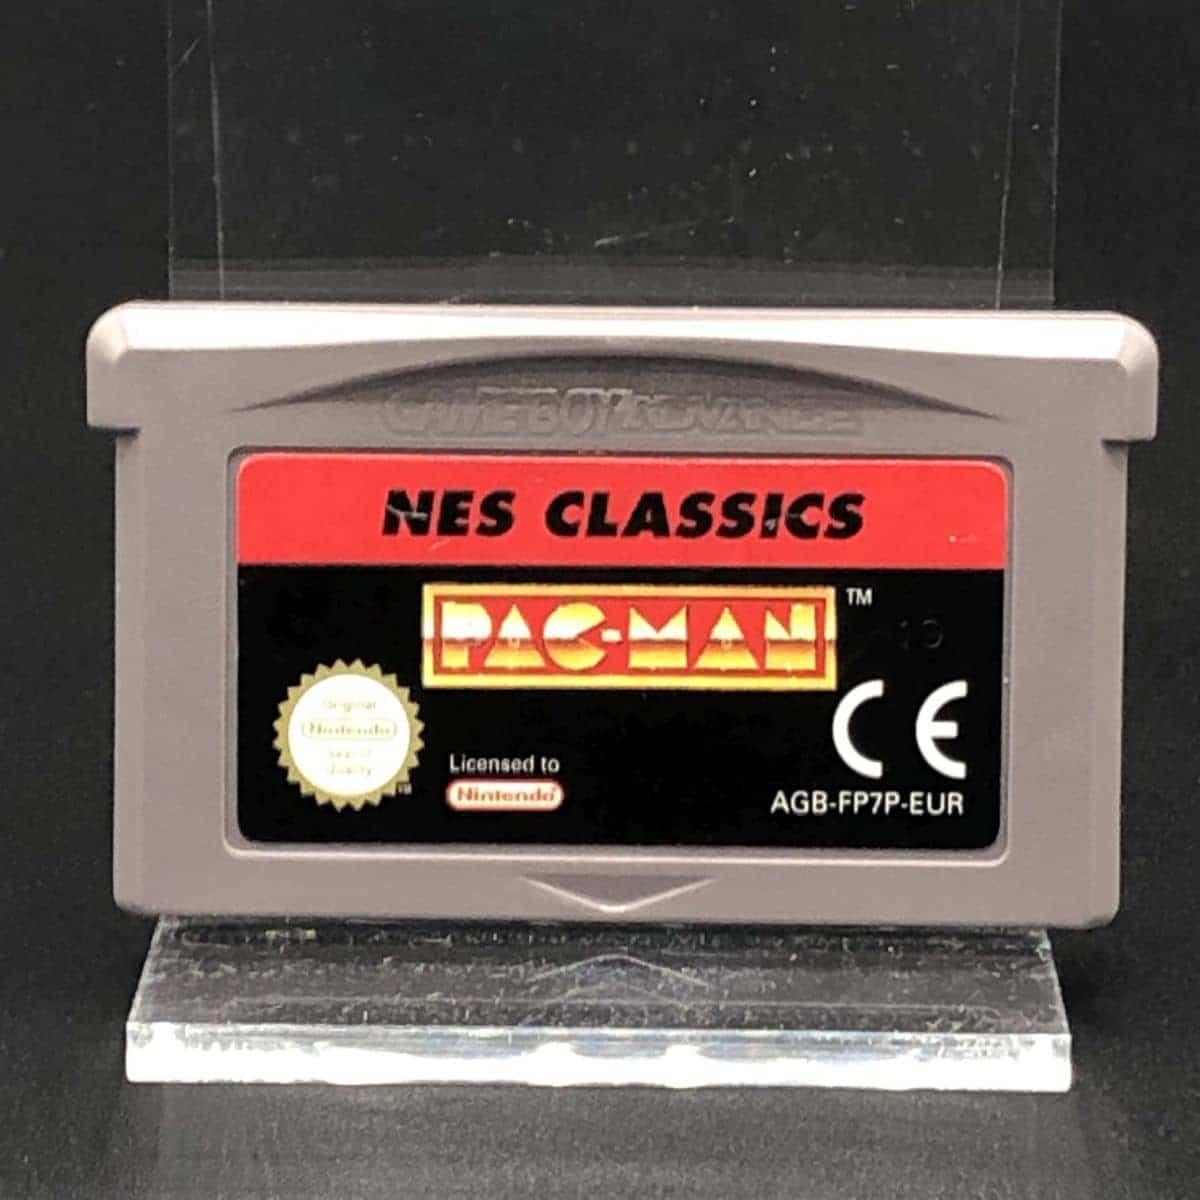 GBA NES Classics - Pac-Man (Modul) (Gut) Game Boy Advance